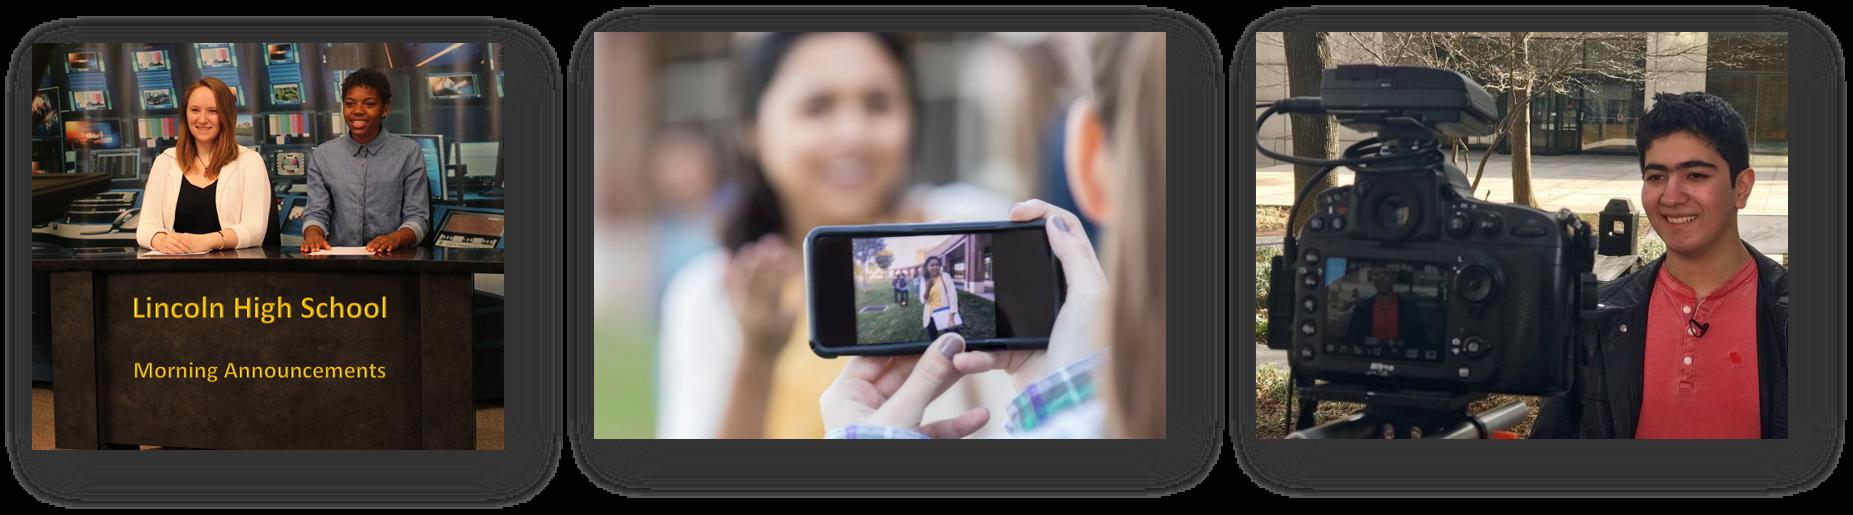 SchoolTube Free K12 Video Hosting